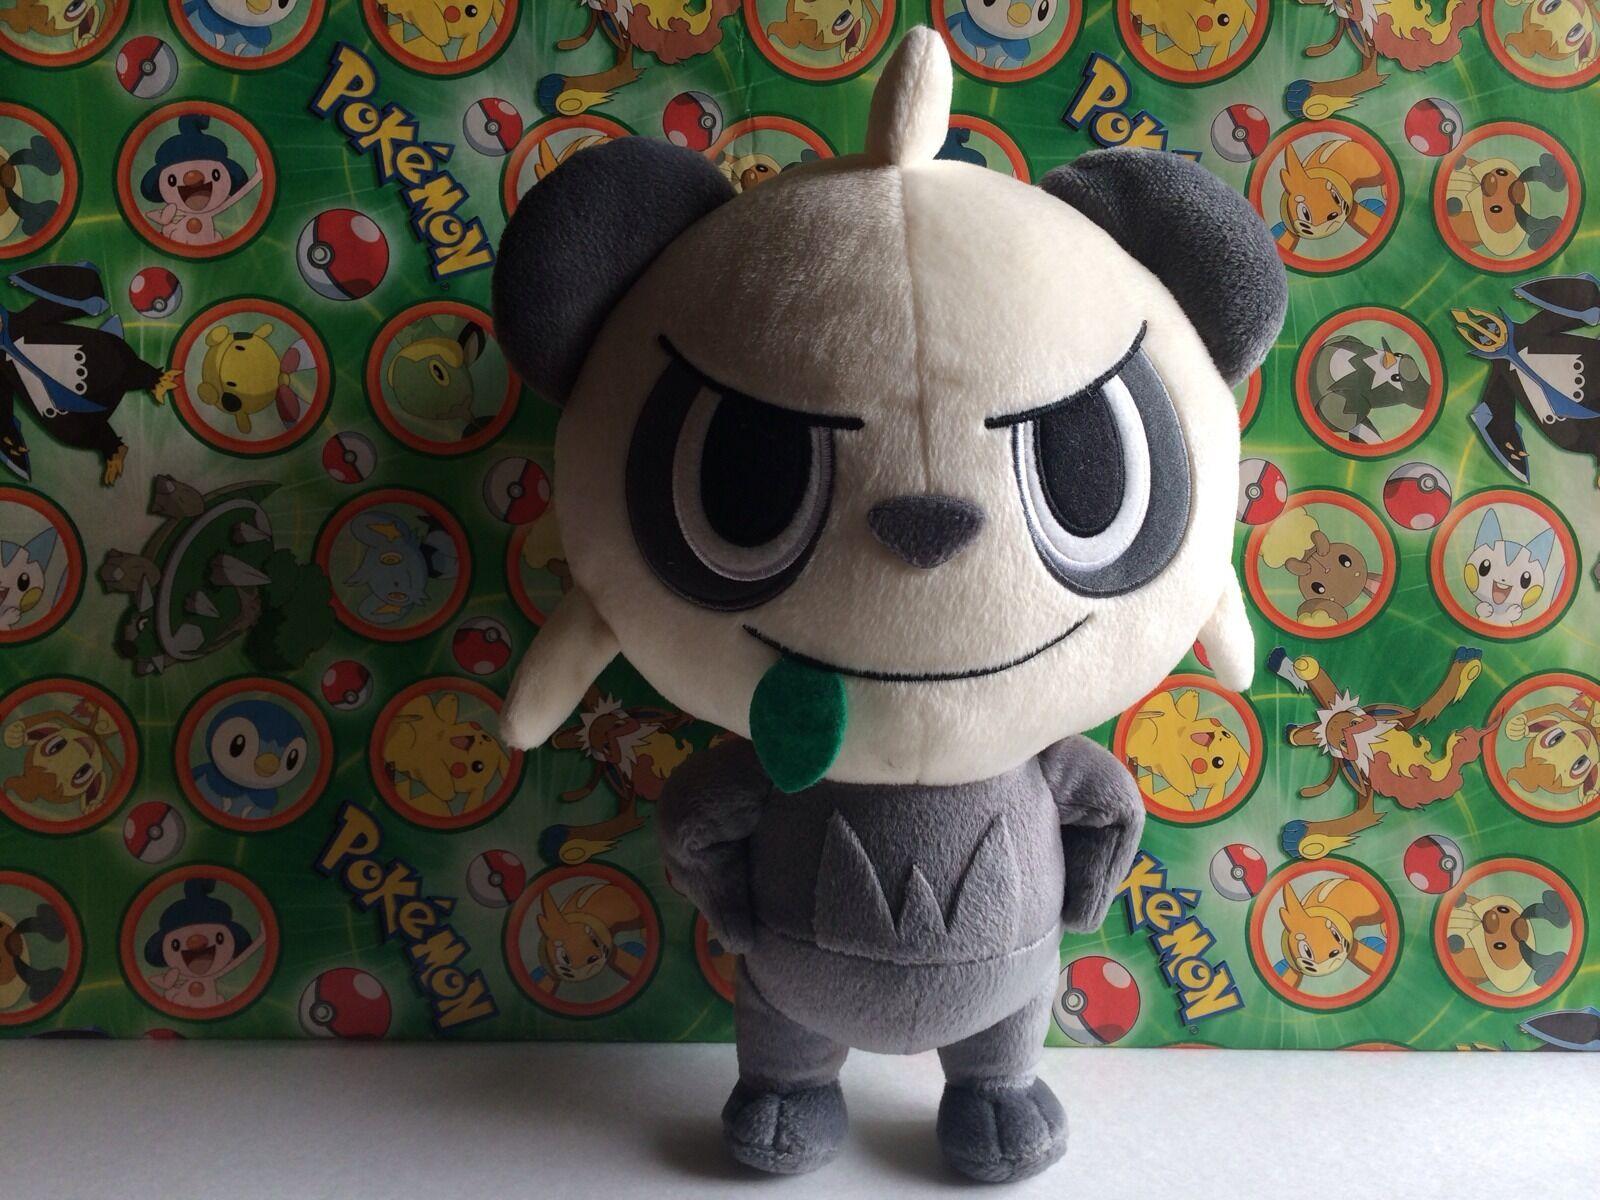 8b0a0d14e8a Pokemon Plush Panda DX 13 2014 UFO doll figure Stuffed toy US Seller ...